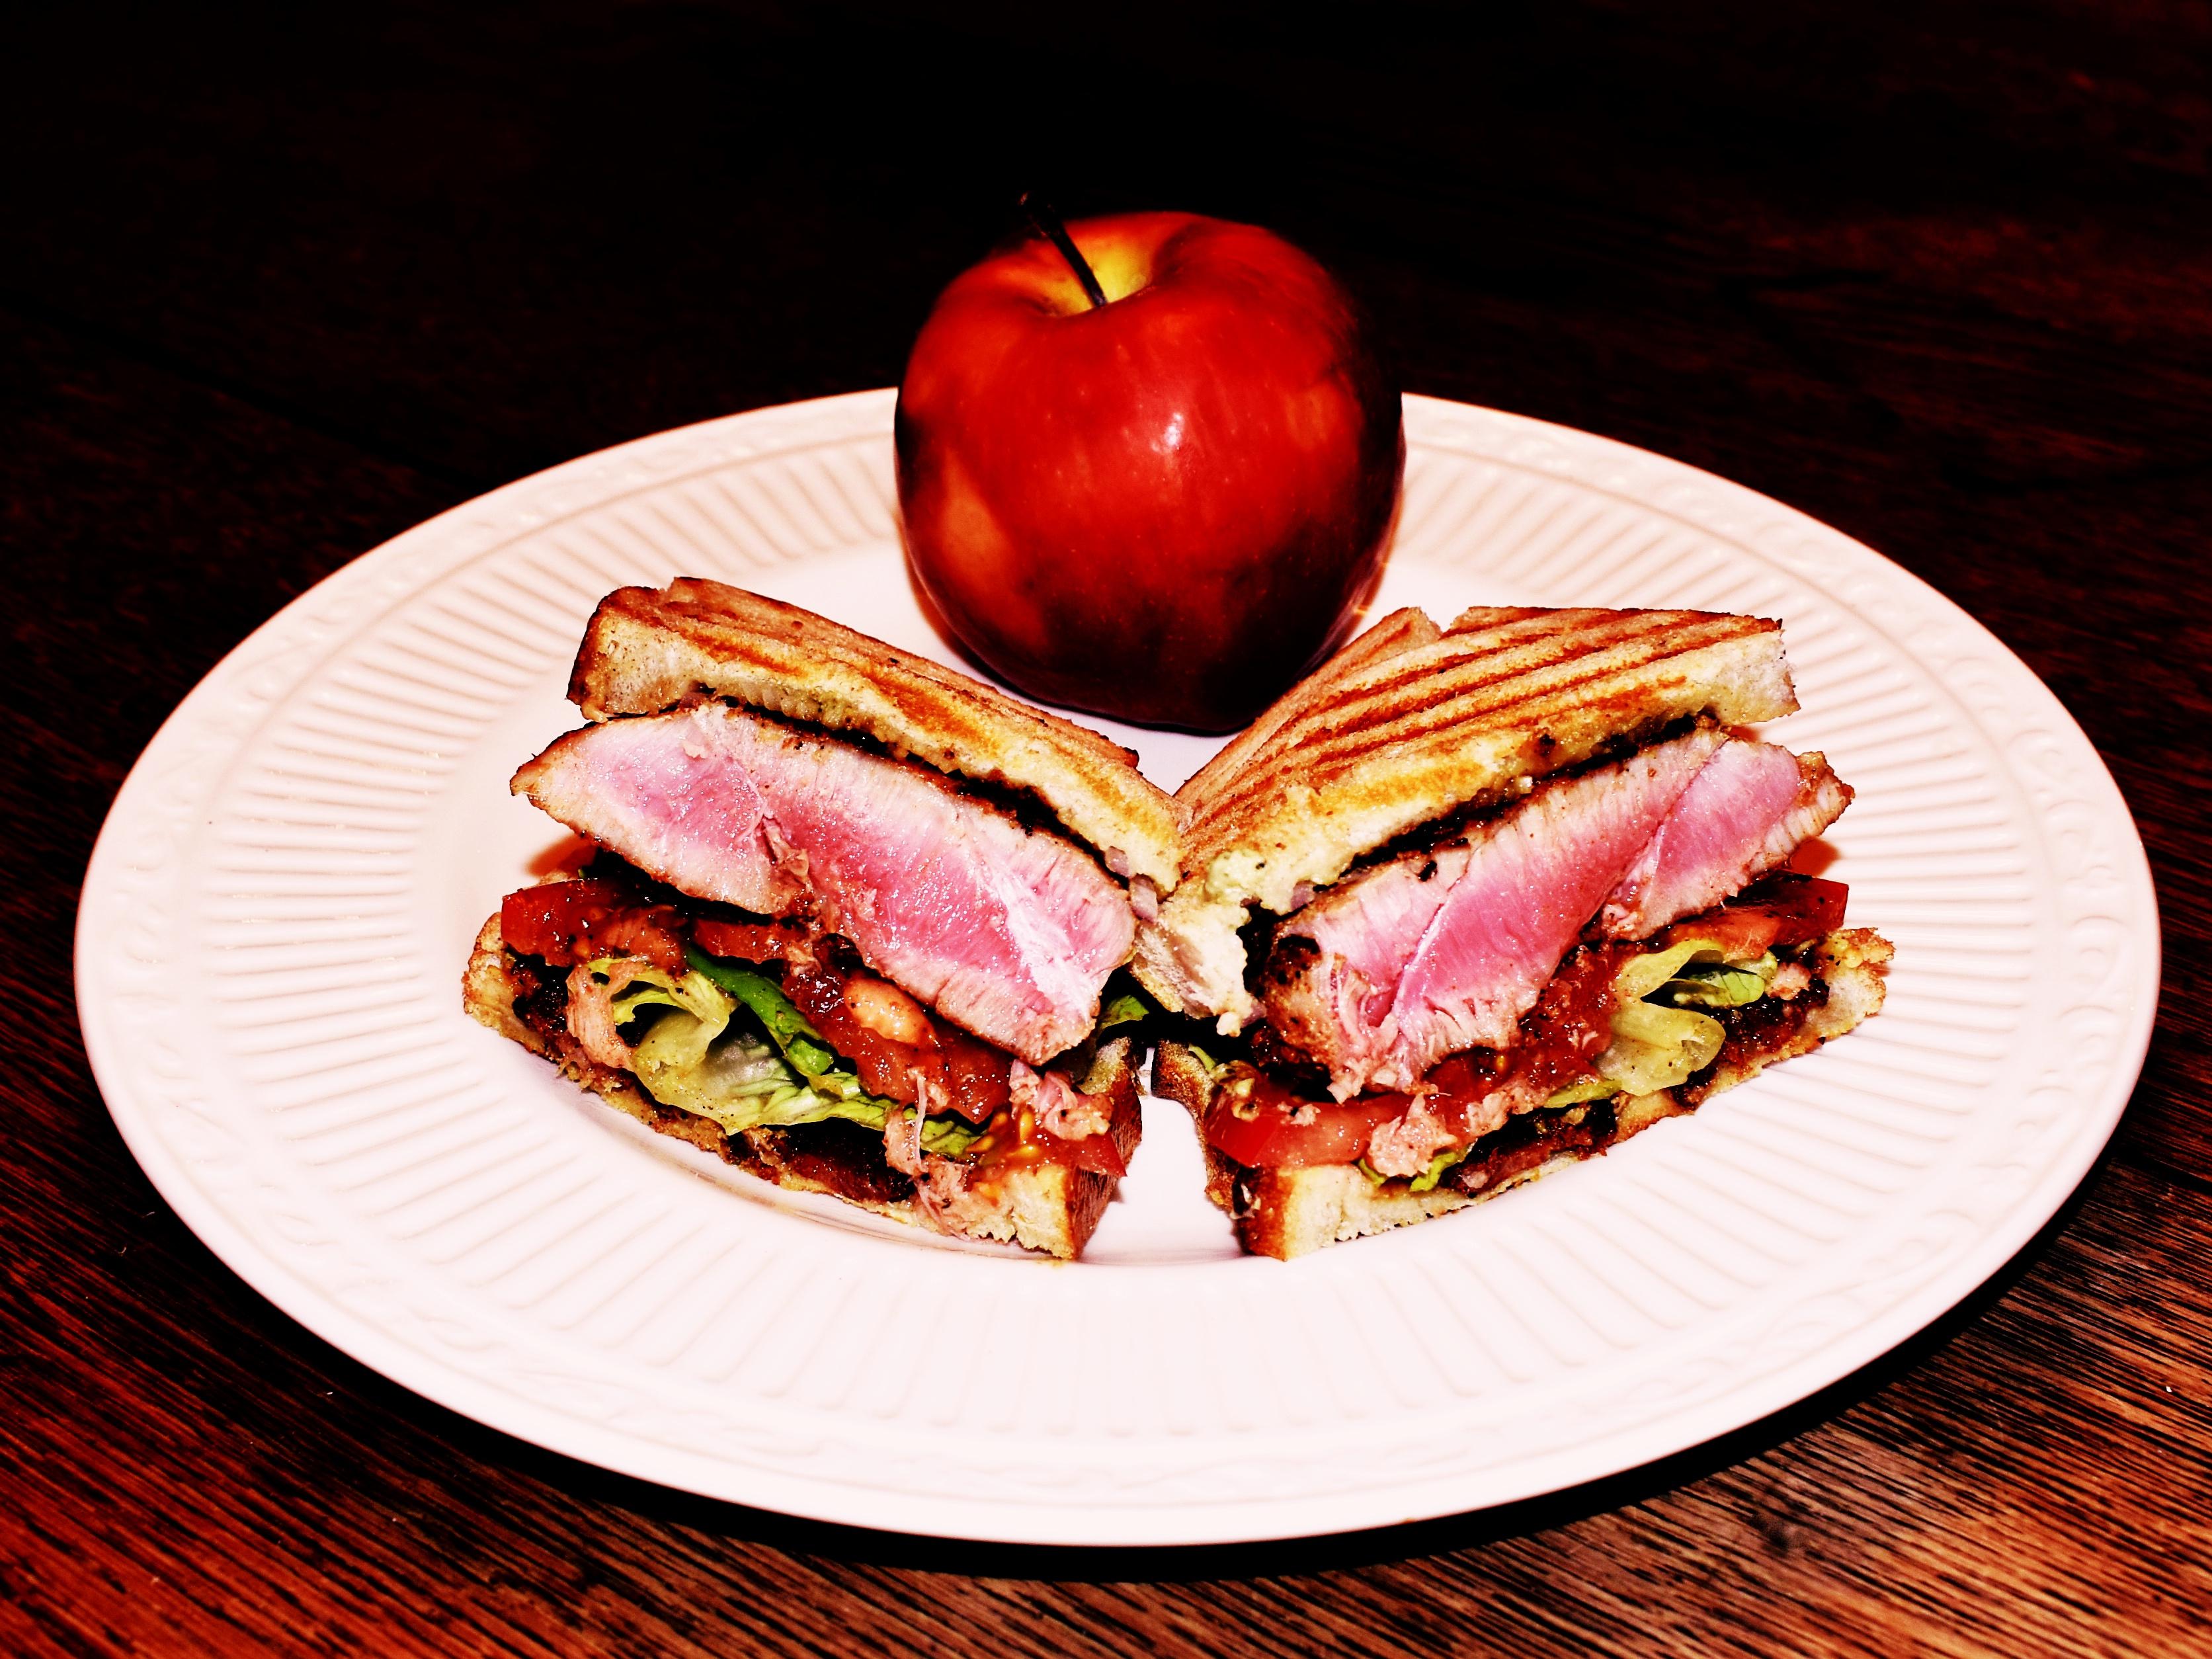 Sandwich Wednesday: The Grill-Meister's Tuna Steak BLT Panini (the TBLT)